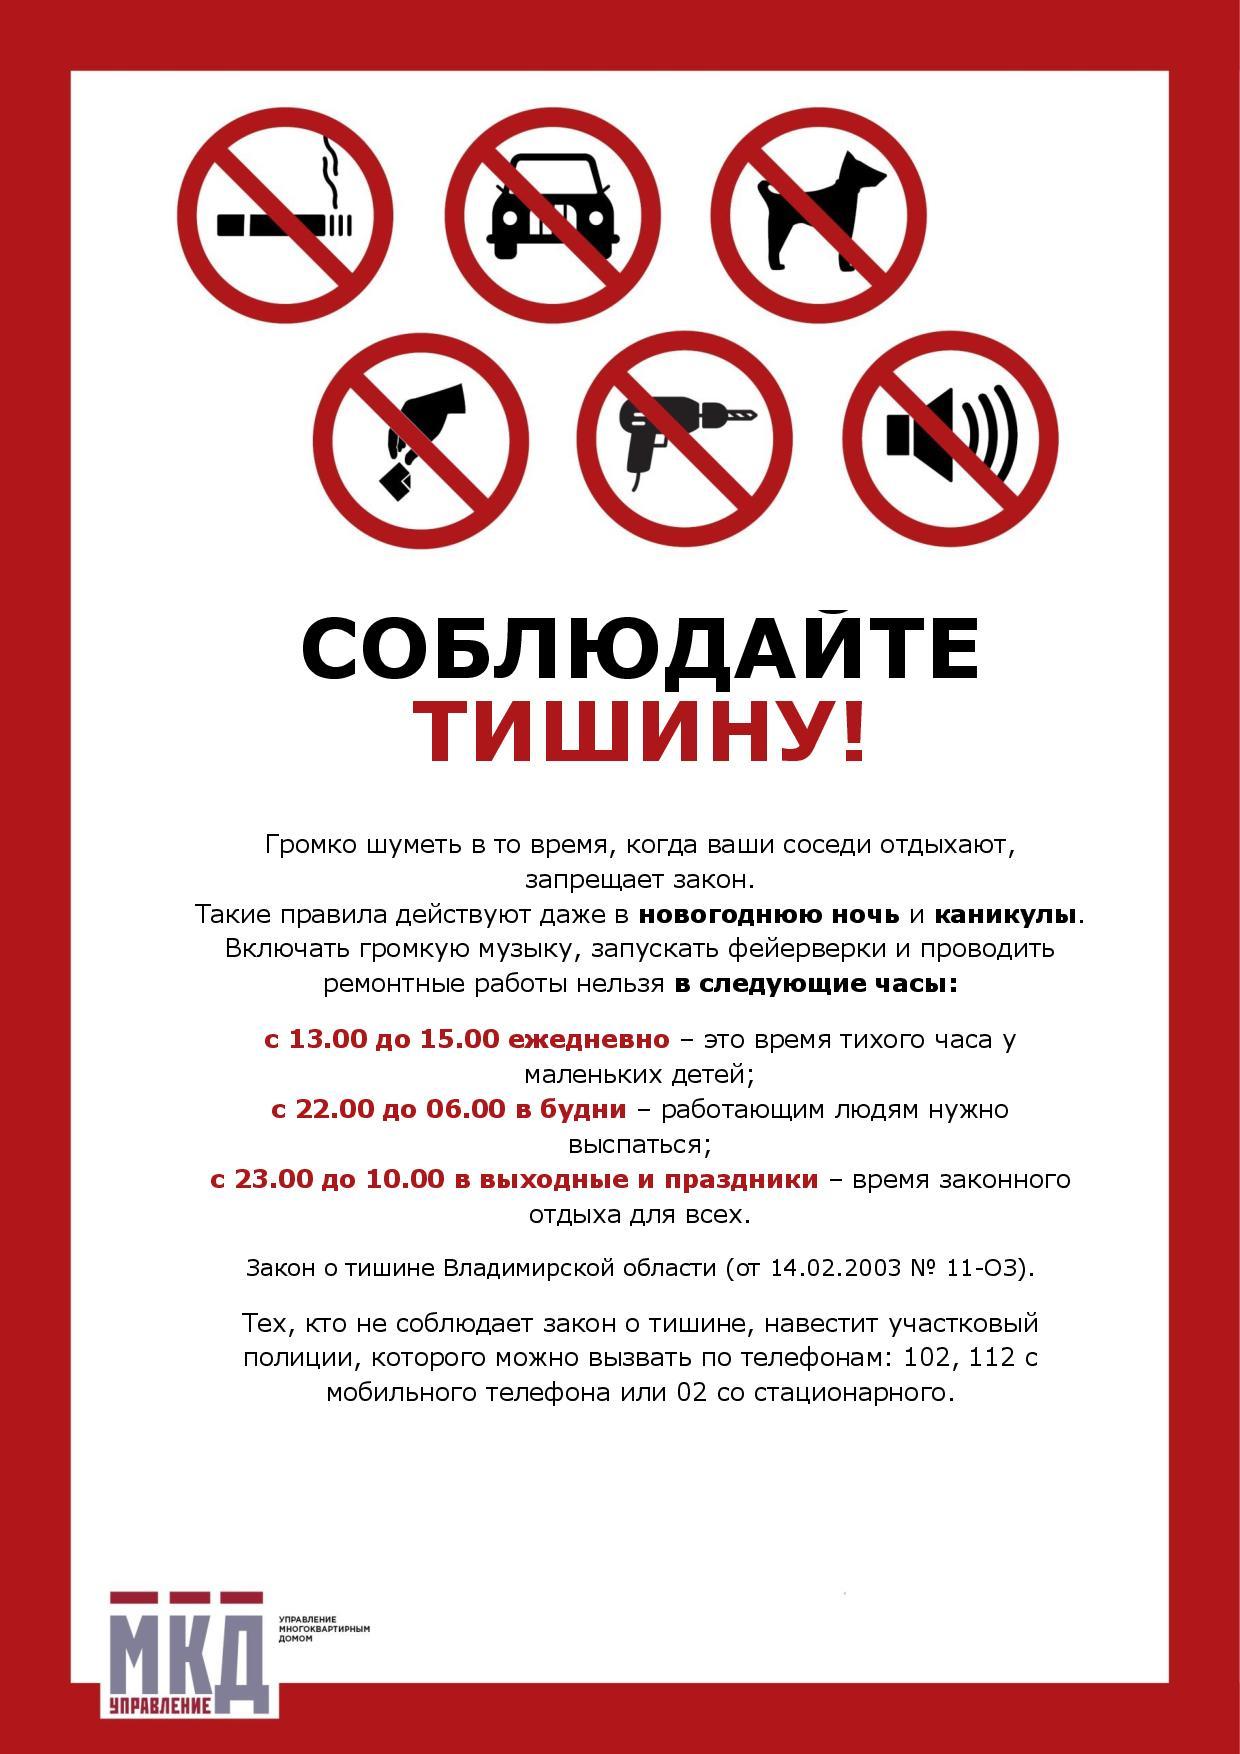 zakon o tishine v sverdlovskoj oblasti i ekaterinburge v mnogokvartirnom dome